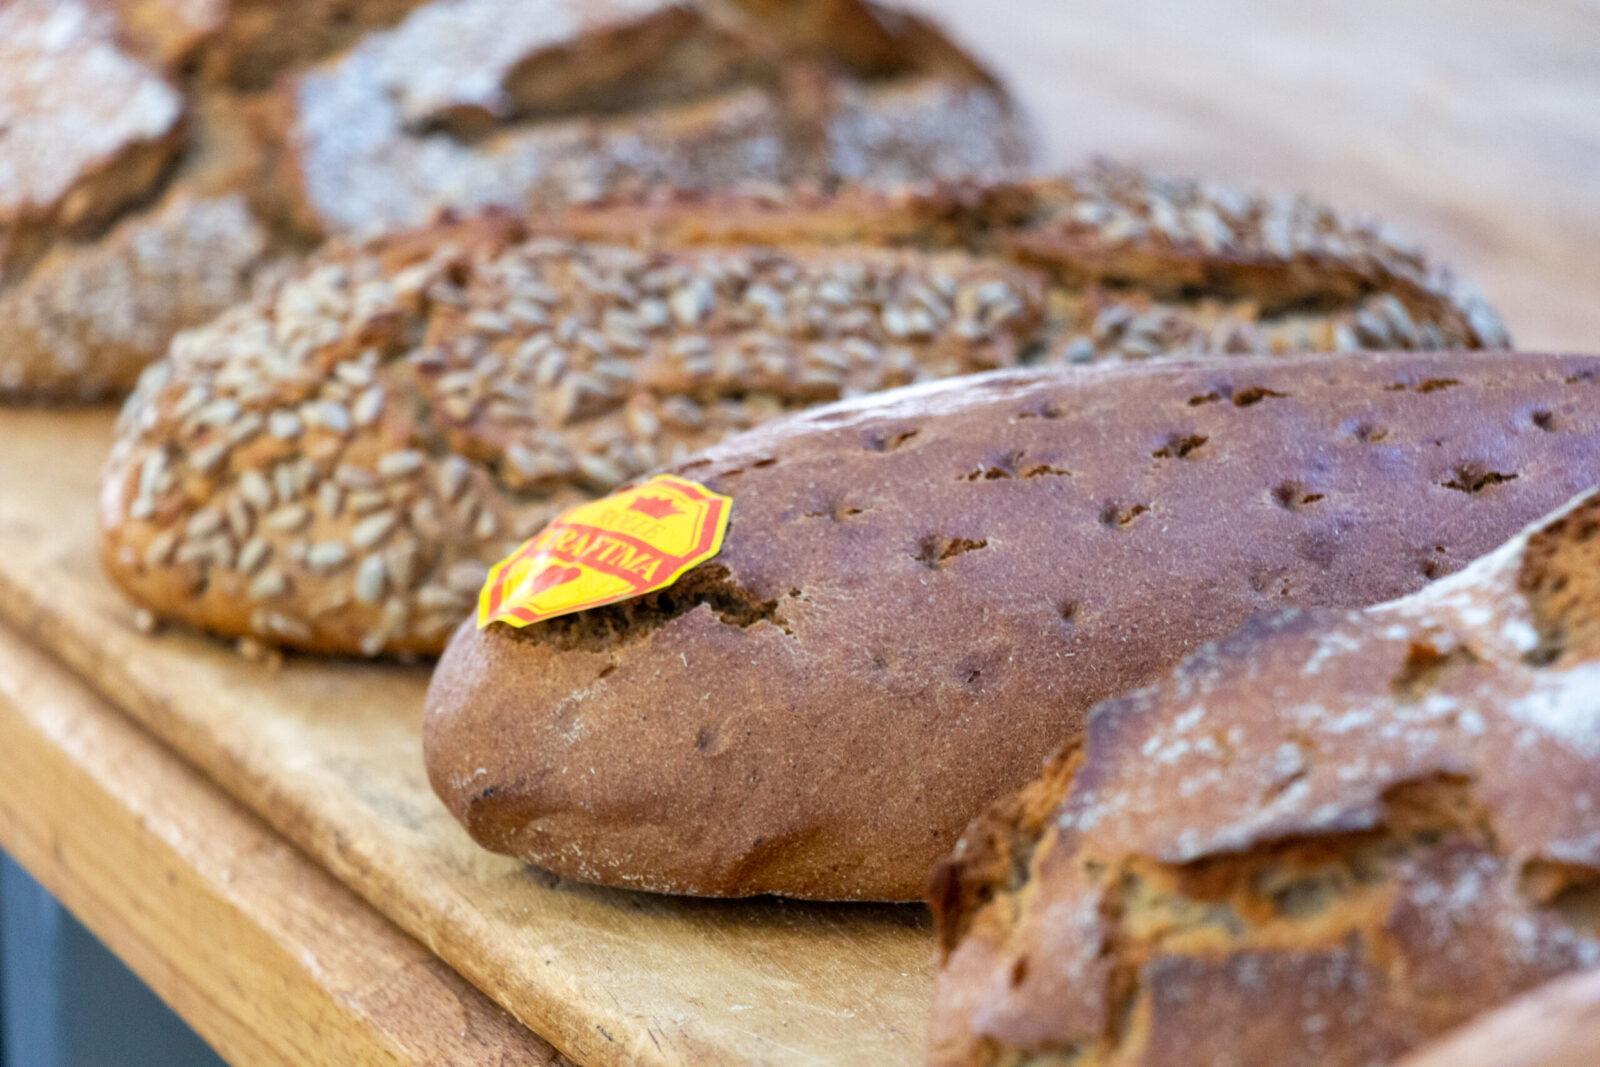 Conditorei & Café Bösewetter - Handgemachtes Brot